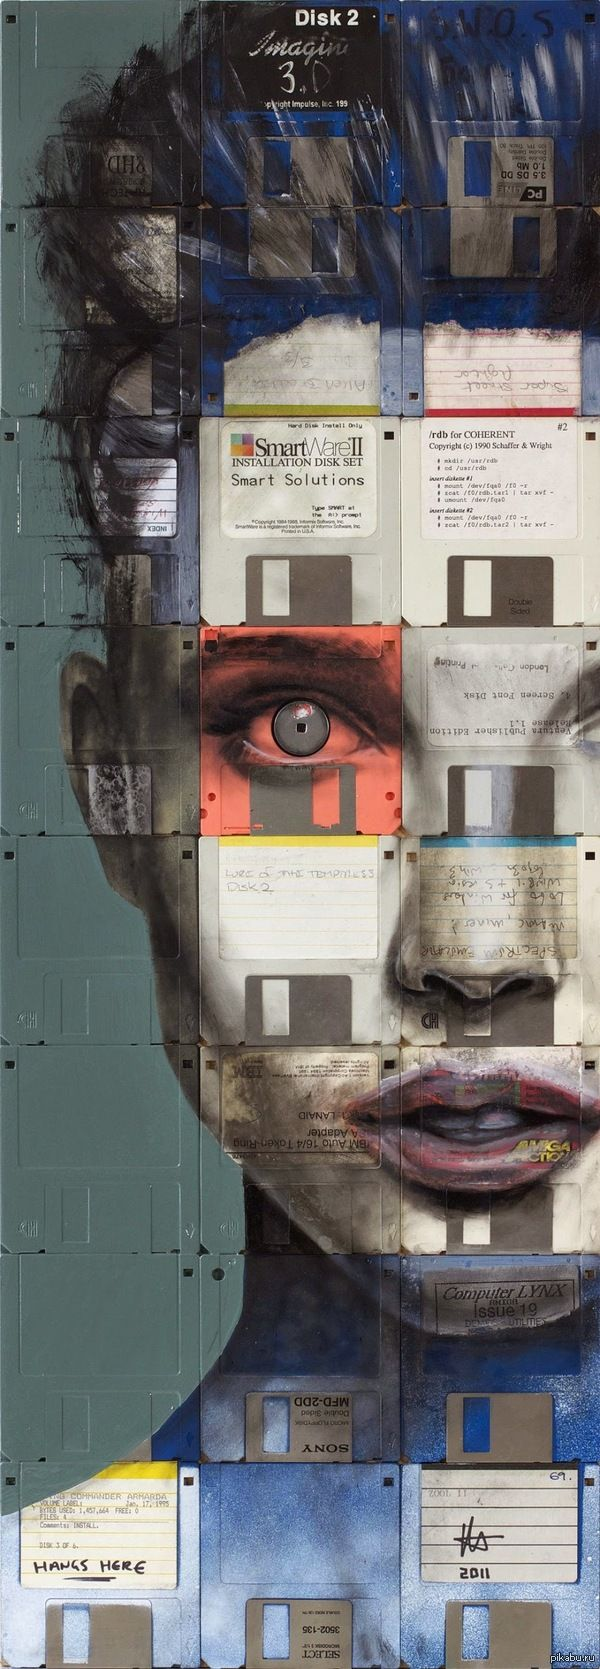 Floppy Disk Paintings By Nick Gentry  портрет, не мое, дискета